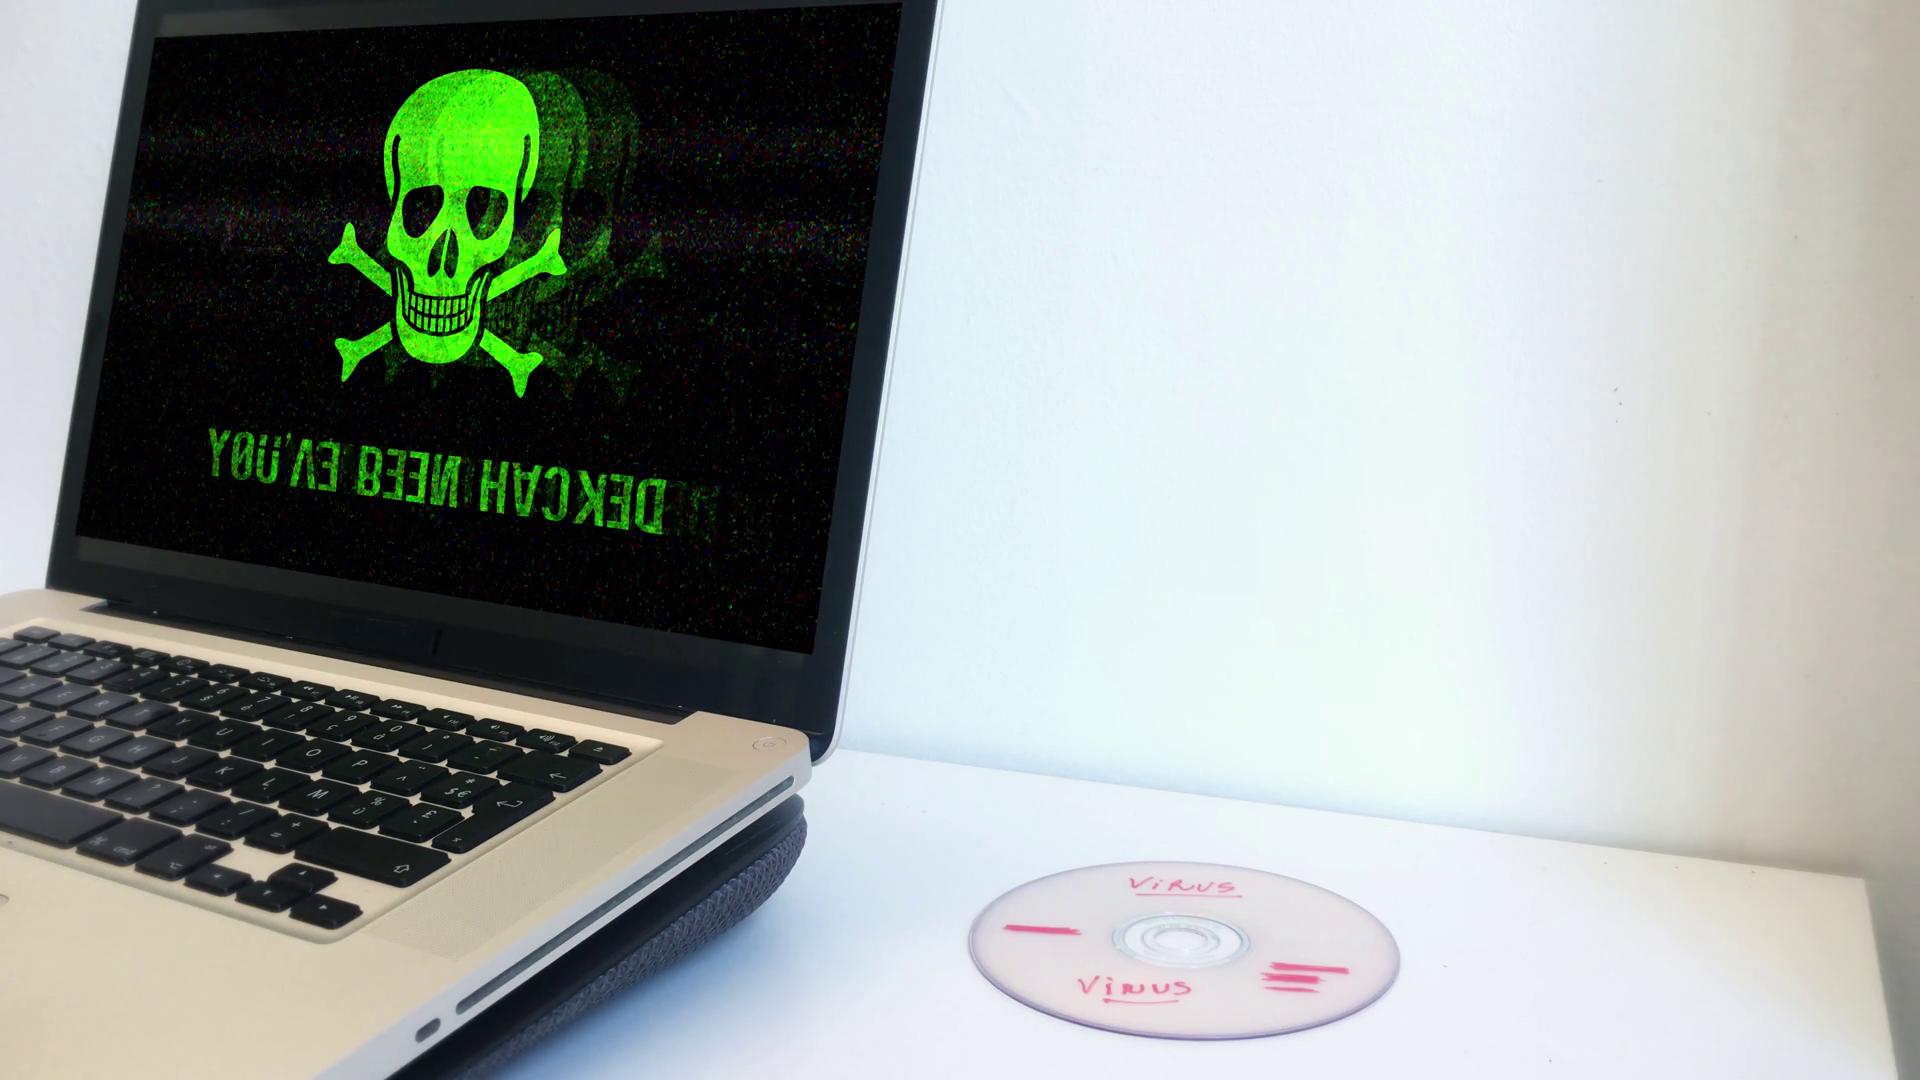 infected-computer-virus-malware-warning-on-screen_baarpk46_thumbnail-full04.png